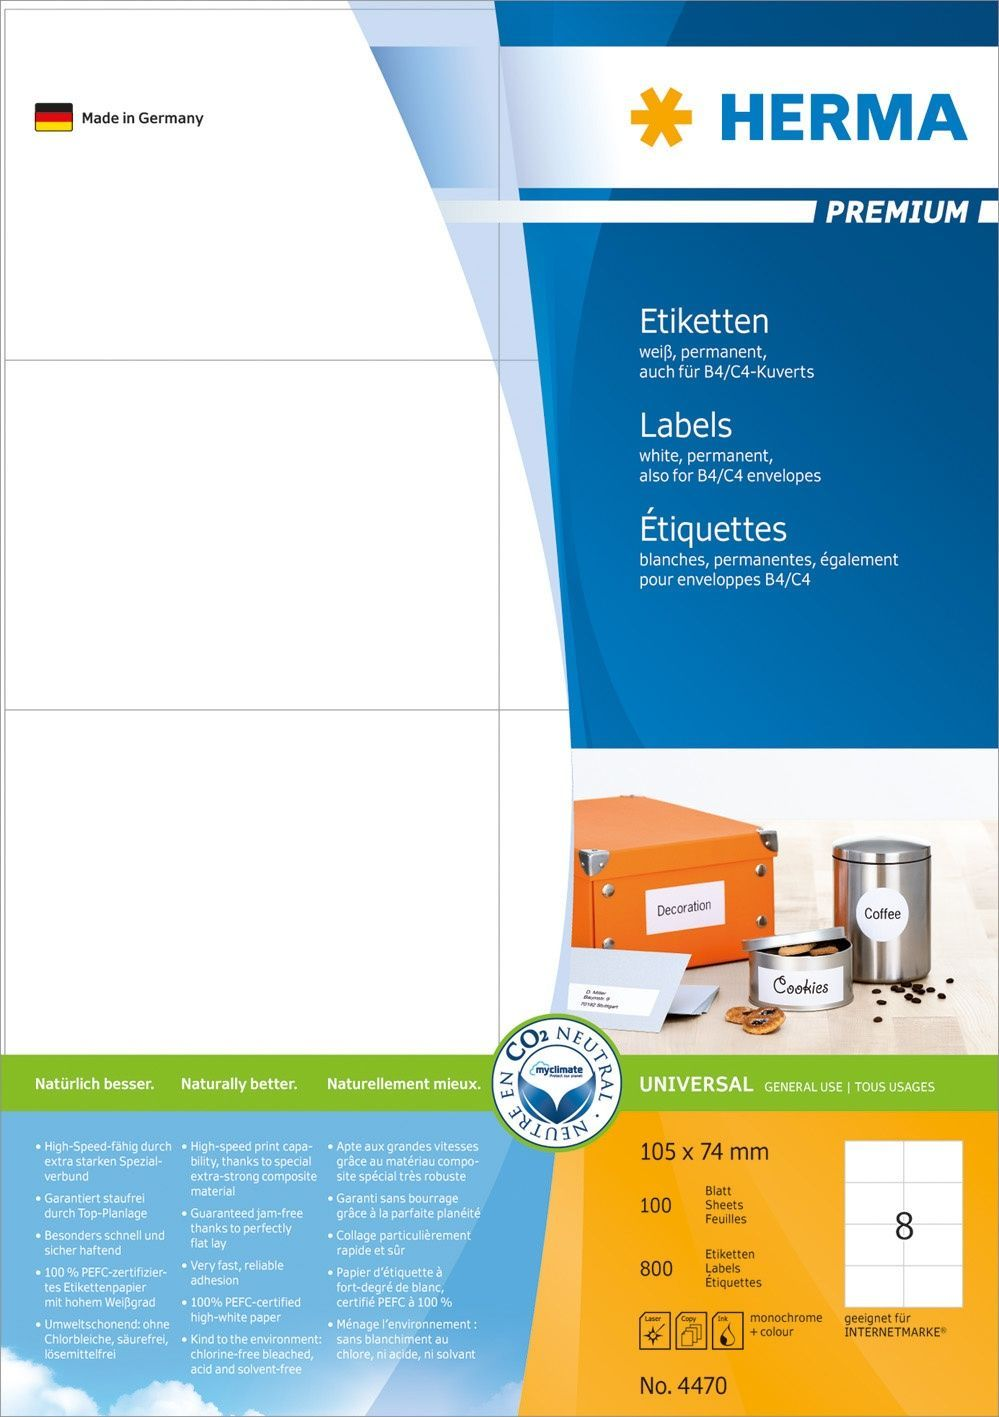 Herma Etikett premium A4 105x74mm (800) Y450062